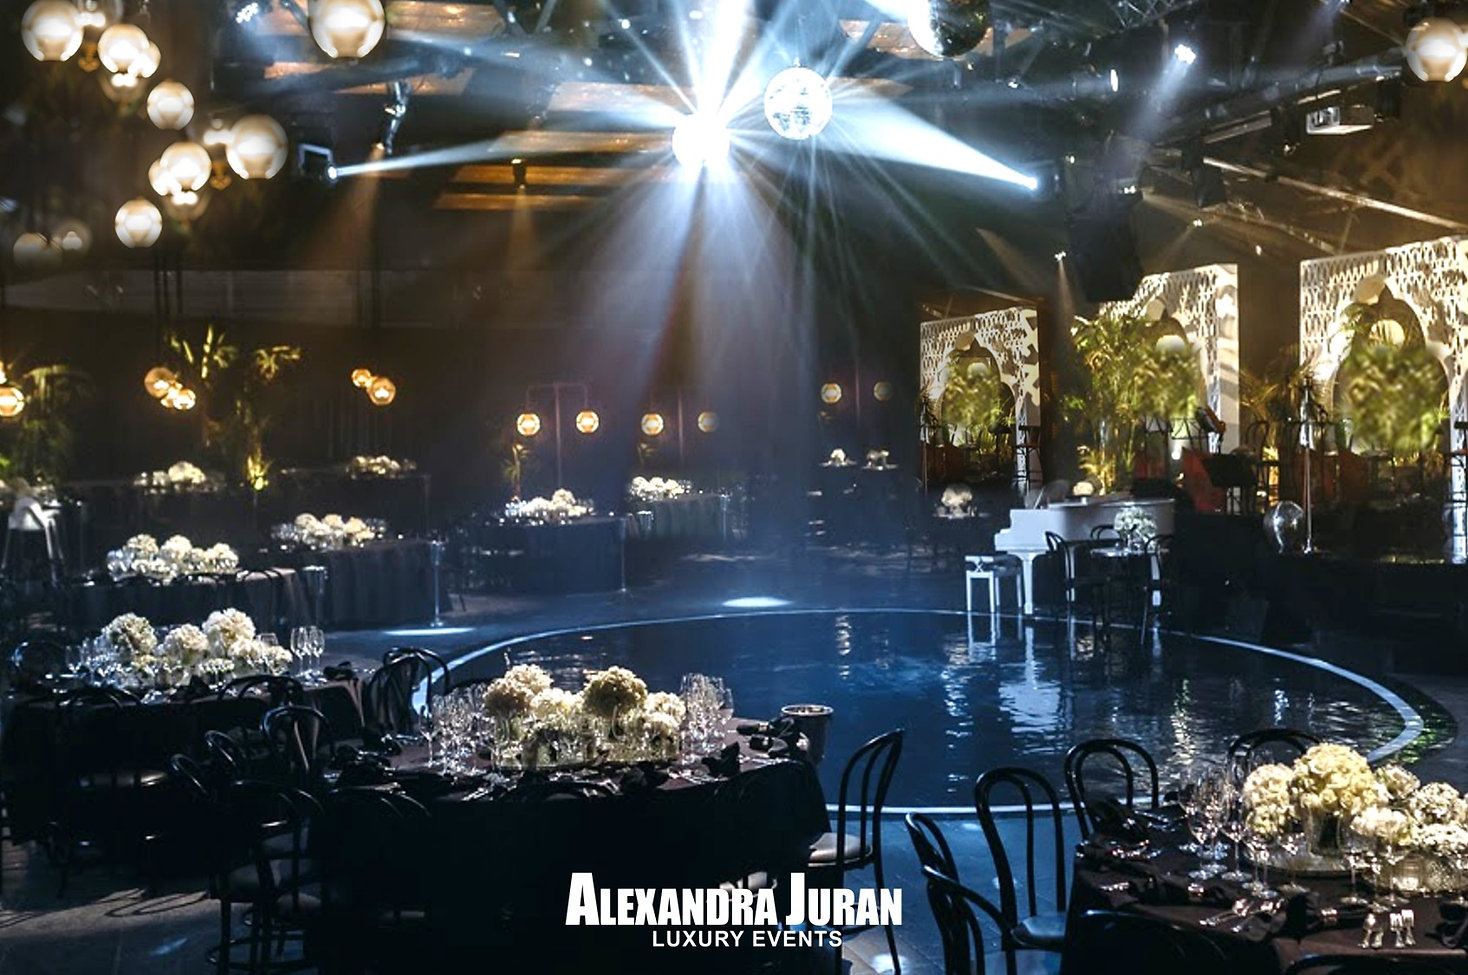 ALEXANDRA JURAN ROCKNROLL BIRTHDAY 3.jpg